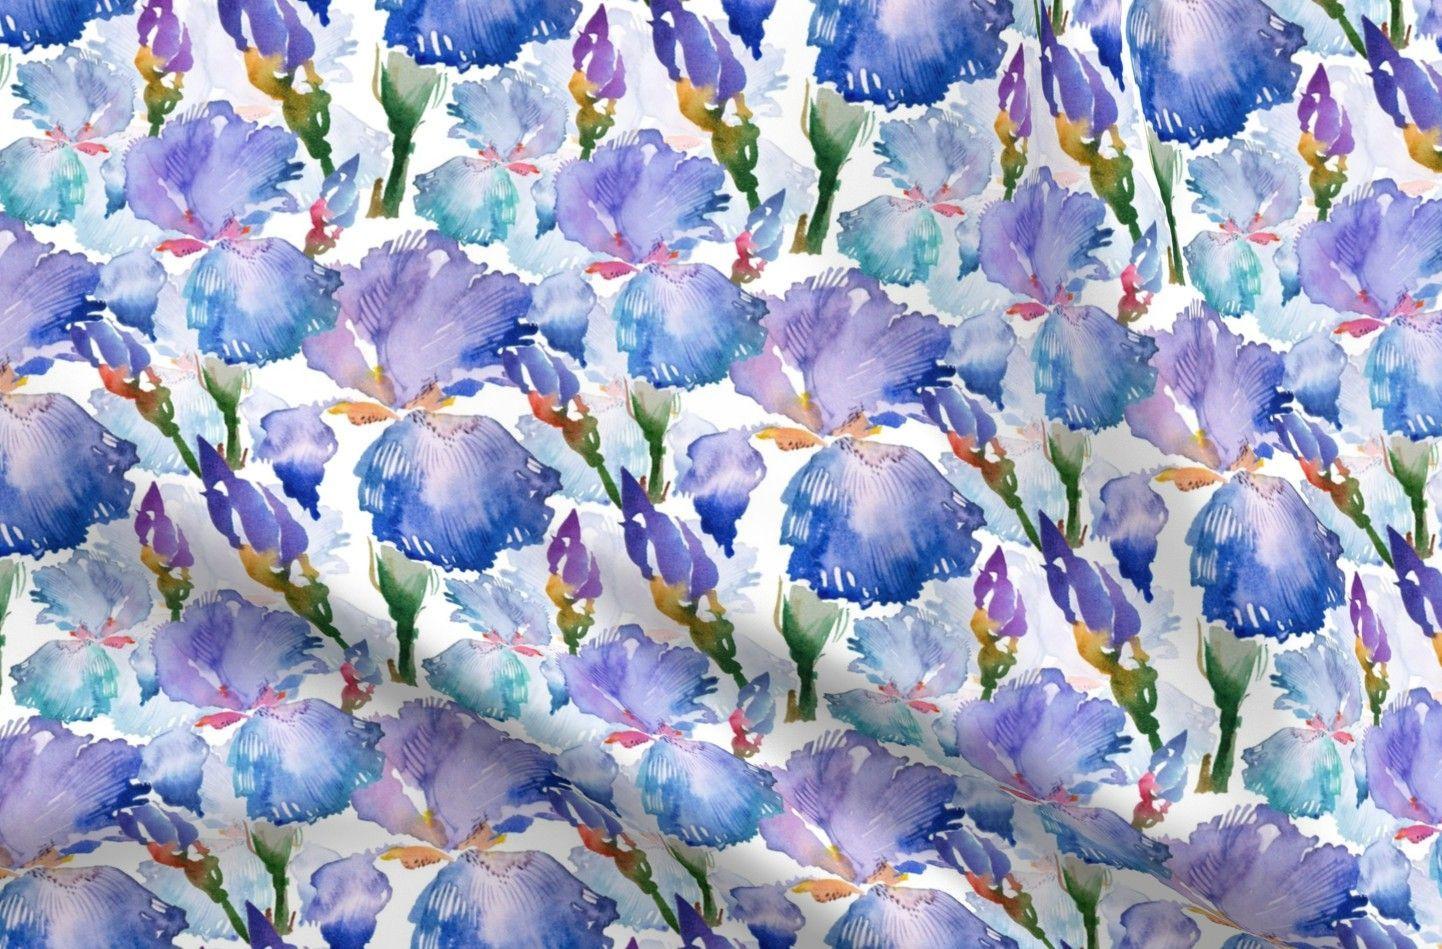 Watercolor Irises Cotton Fabric Swatch Iris Spring Flower Floral Botanical Flowers Blossom Su In 2020 Summer Plants Blossom Flower Spring Flowers